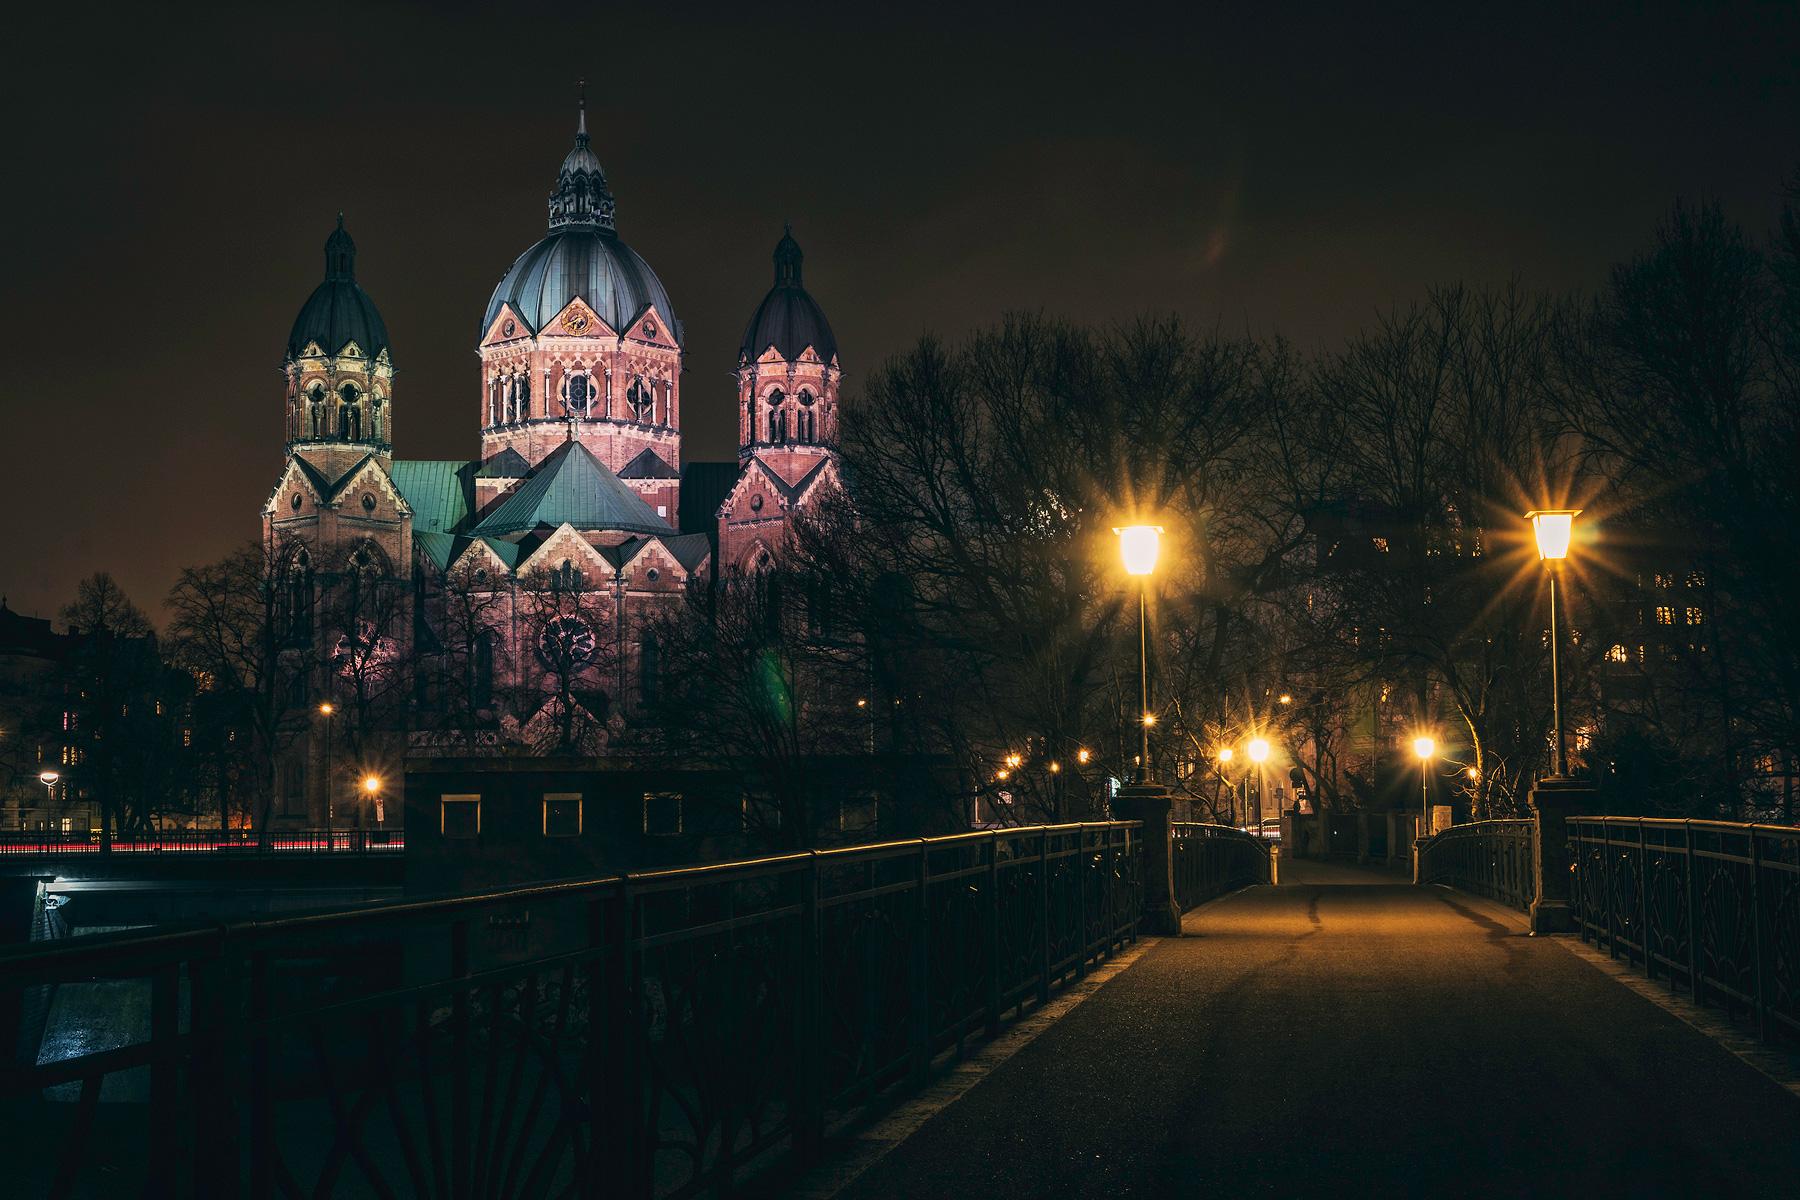 München, St. Lukas, Kirche, Nachtaufnahme, Kabelsteg